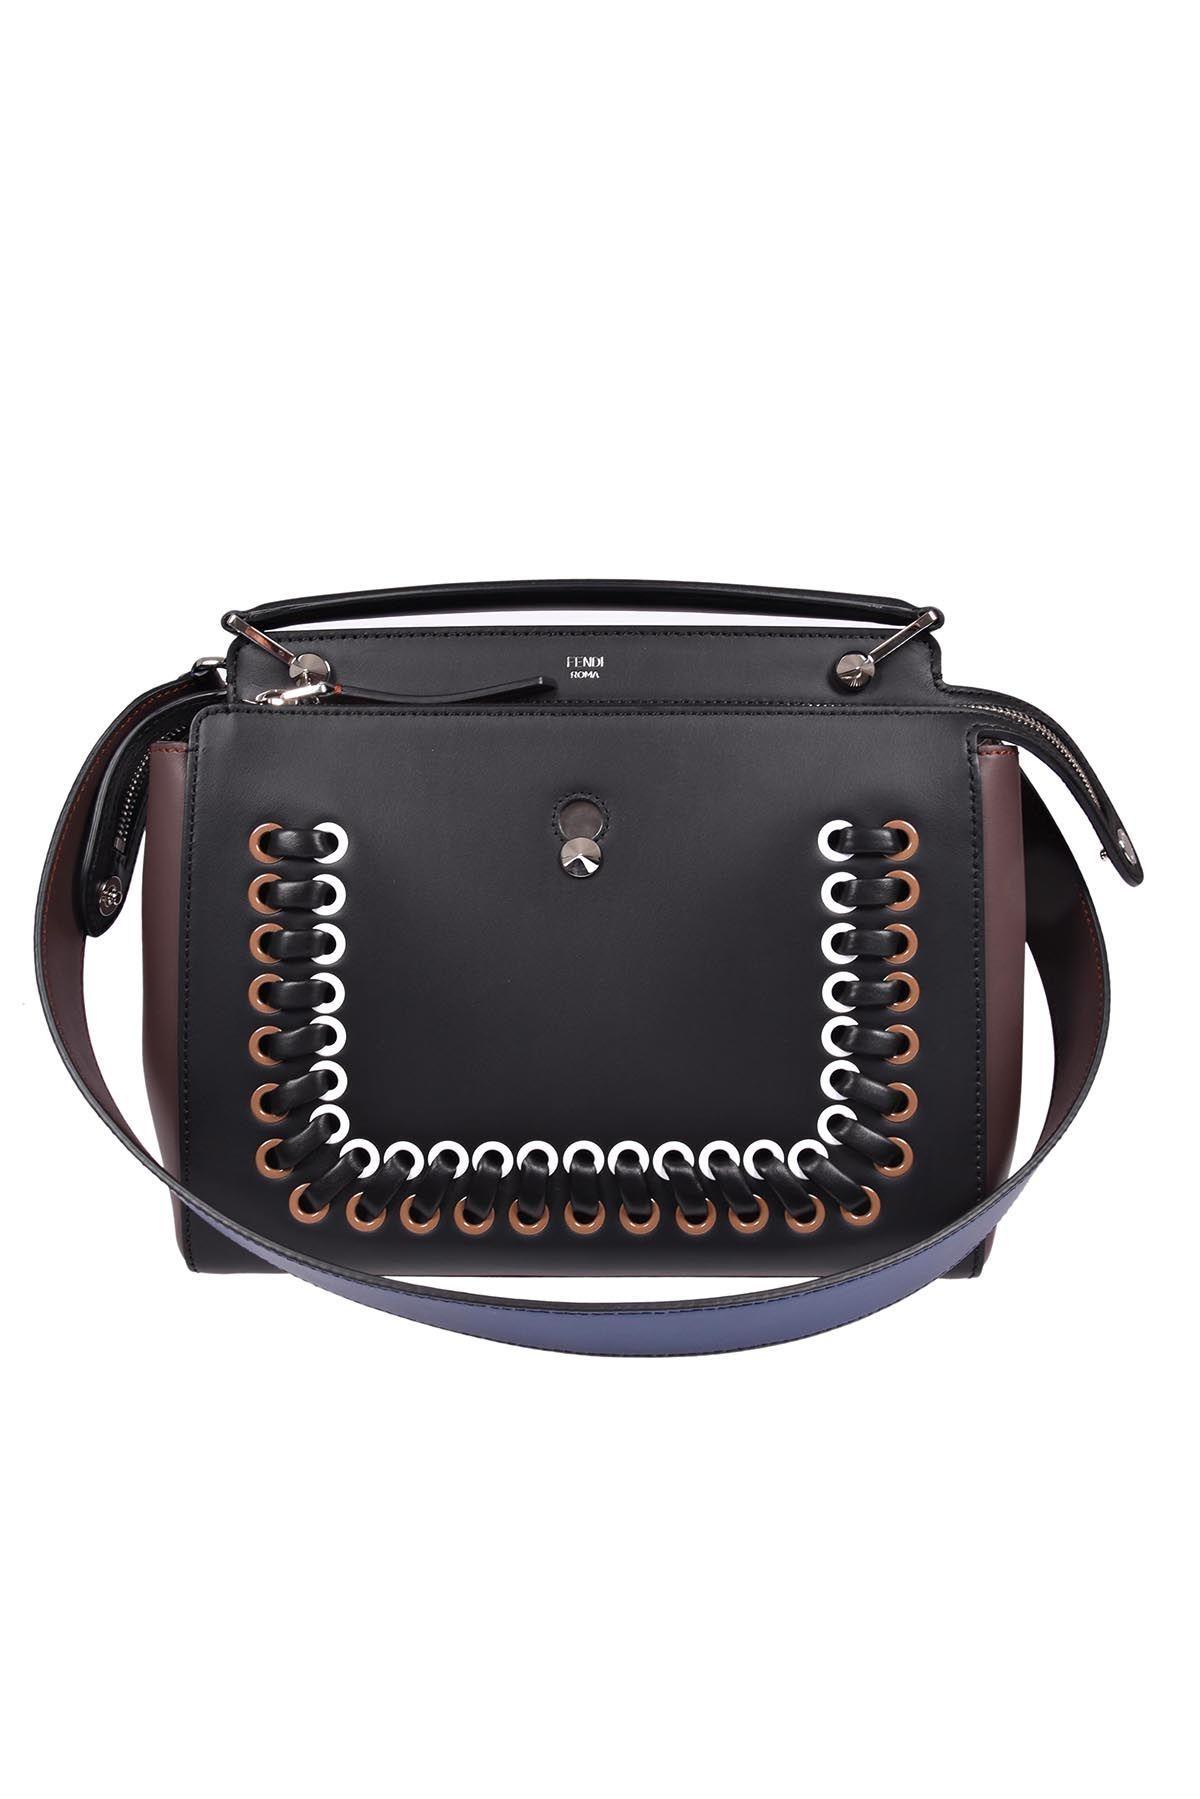 Fendi Dot Com Handbag In F07nm Nero+moresco+mlc+p